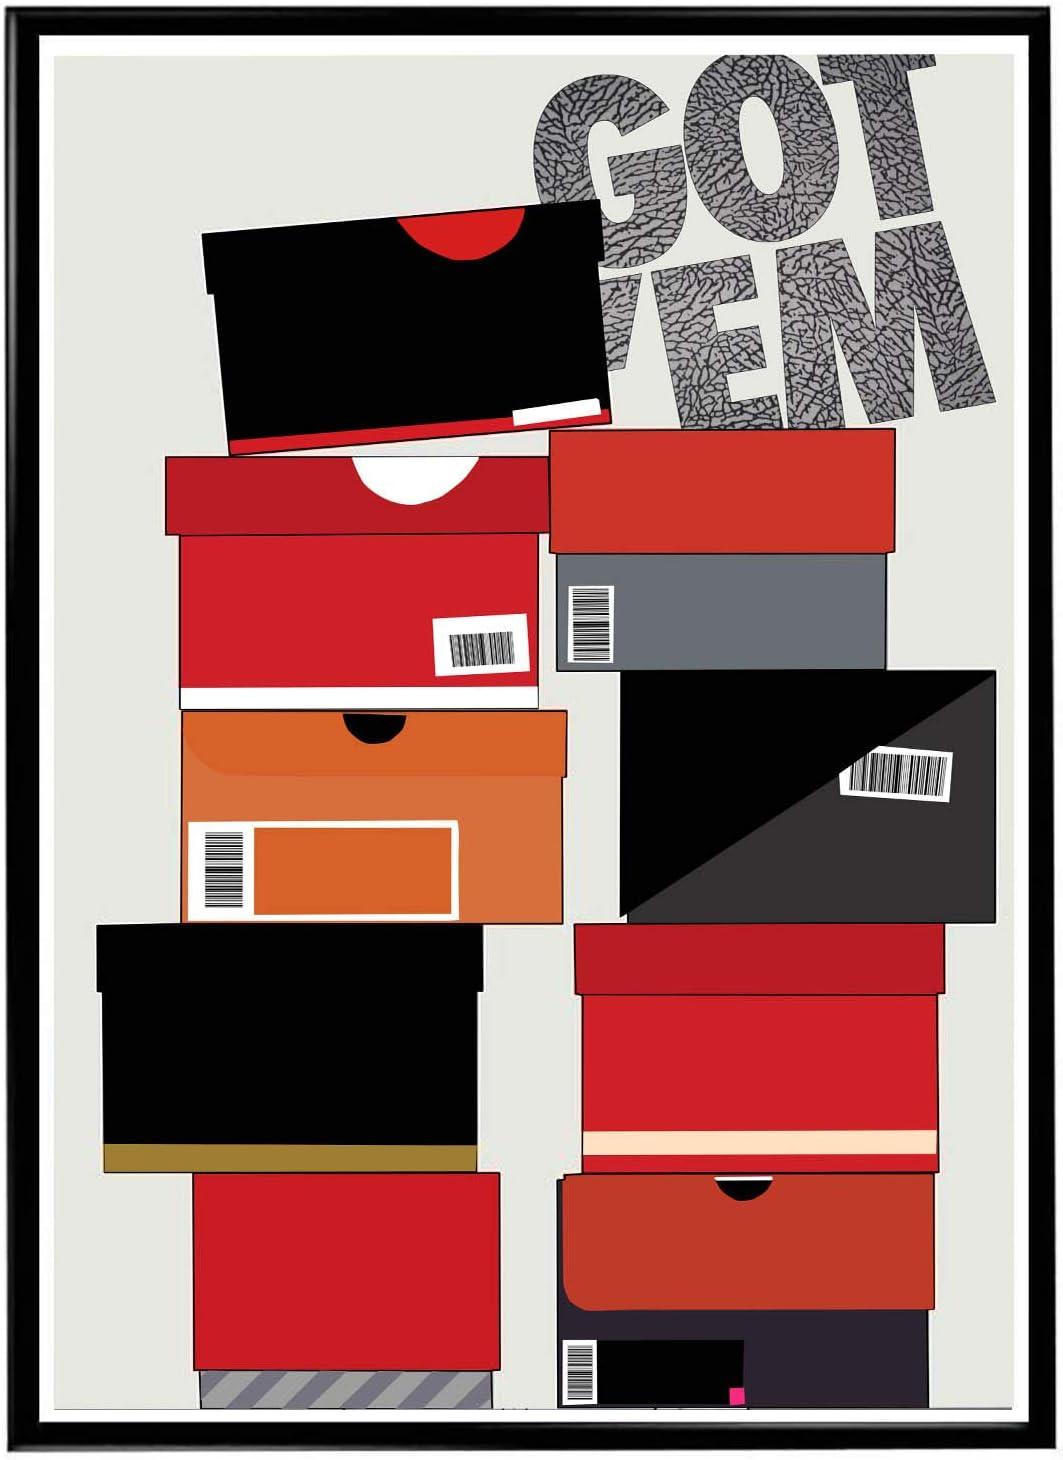 Rob'sTees Custom Sneaker Box Poster, Got Em Sneaker Poster, Hype Poster, Kicks Poster, Pop Culture Sneaker Art Wall Decor Streetwear Art (Frame NOT Included) (12x18)